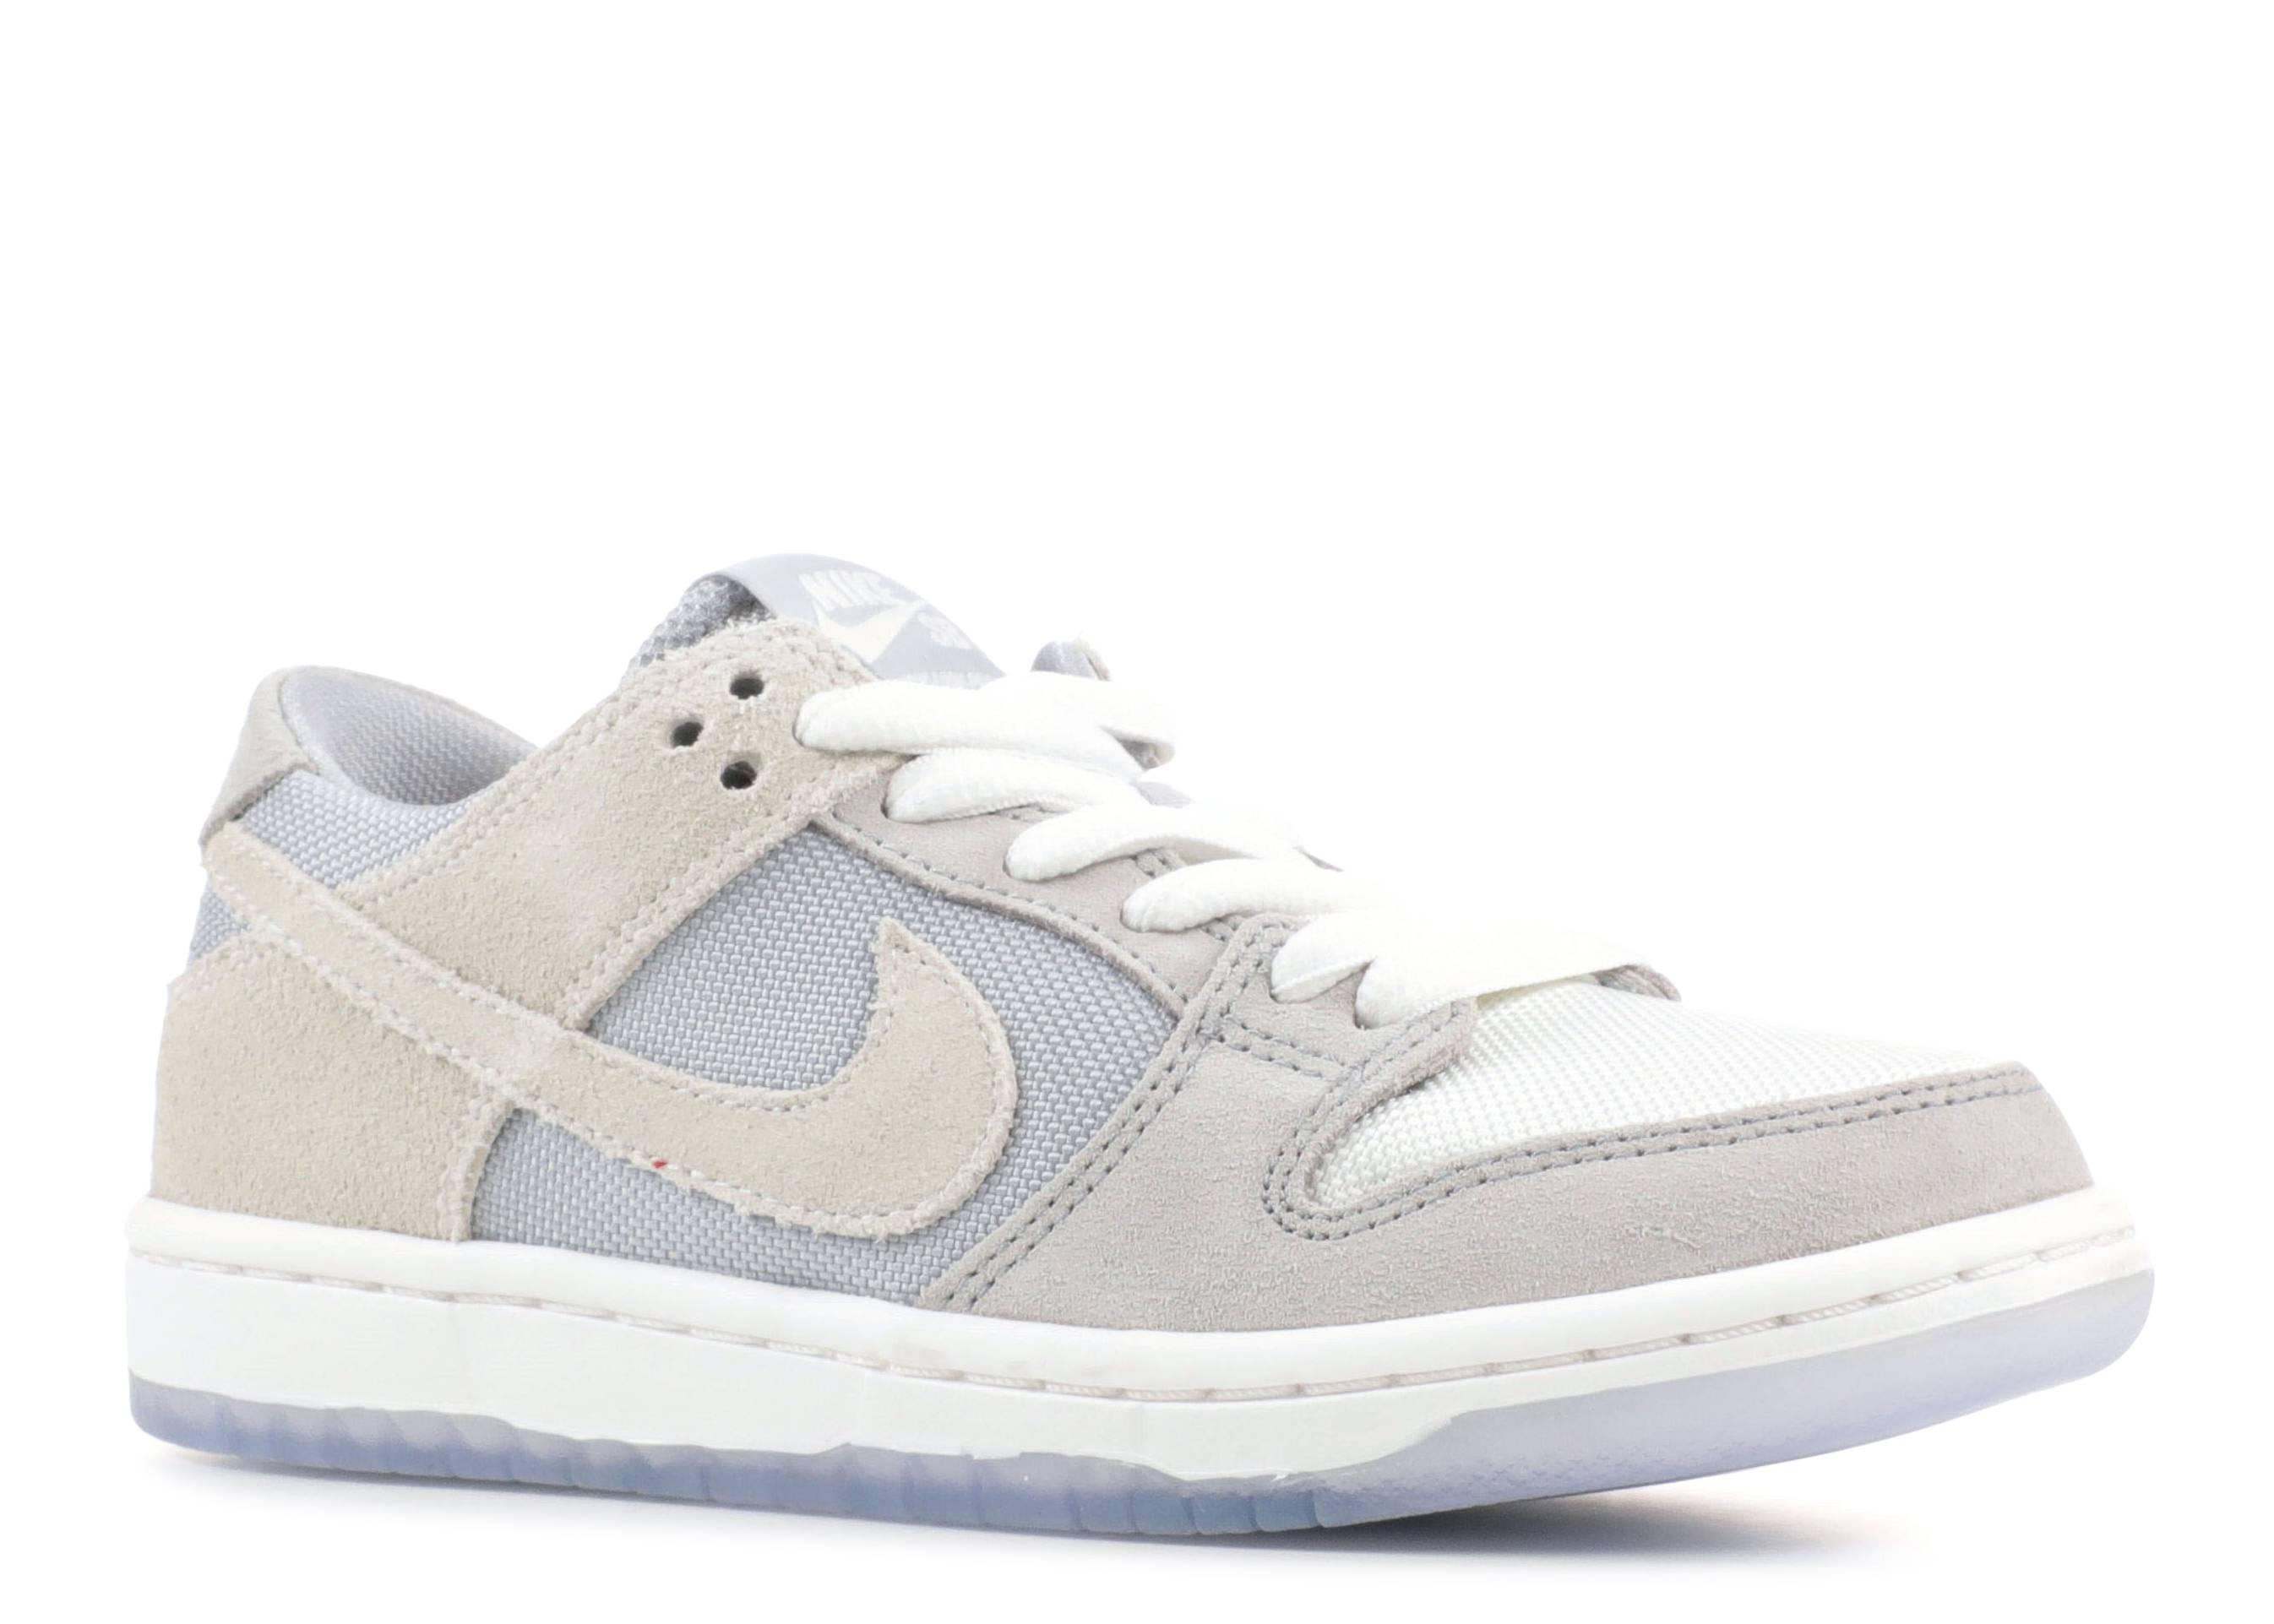 finest selection 5aad2 7957b Nike Sb Zoom Dunk Low Pro - Nike - 854866 011 - wolf grey   summit white- clear   Flight Club